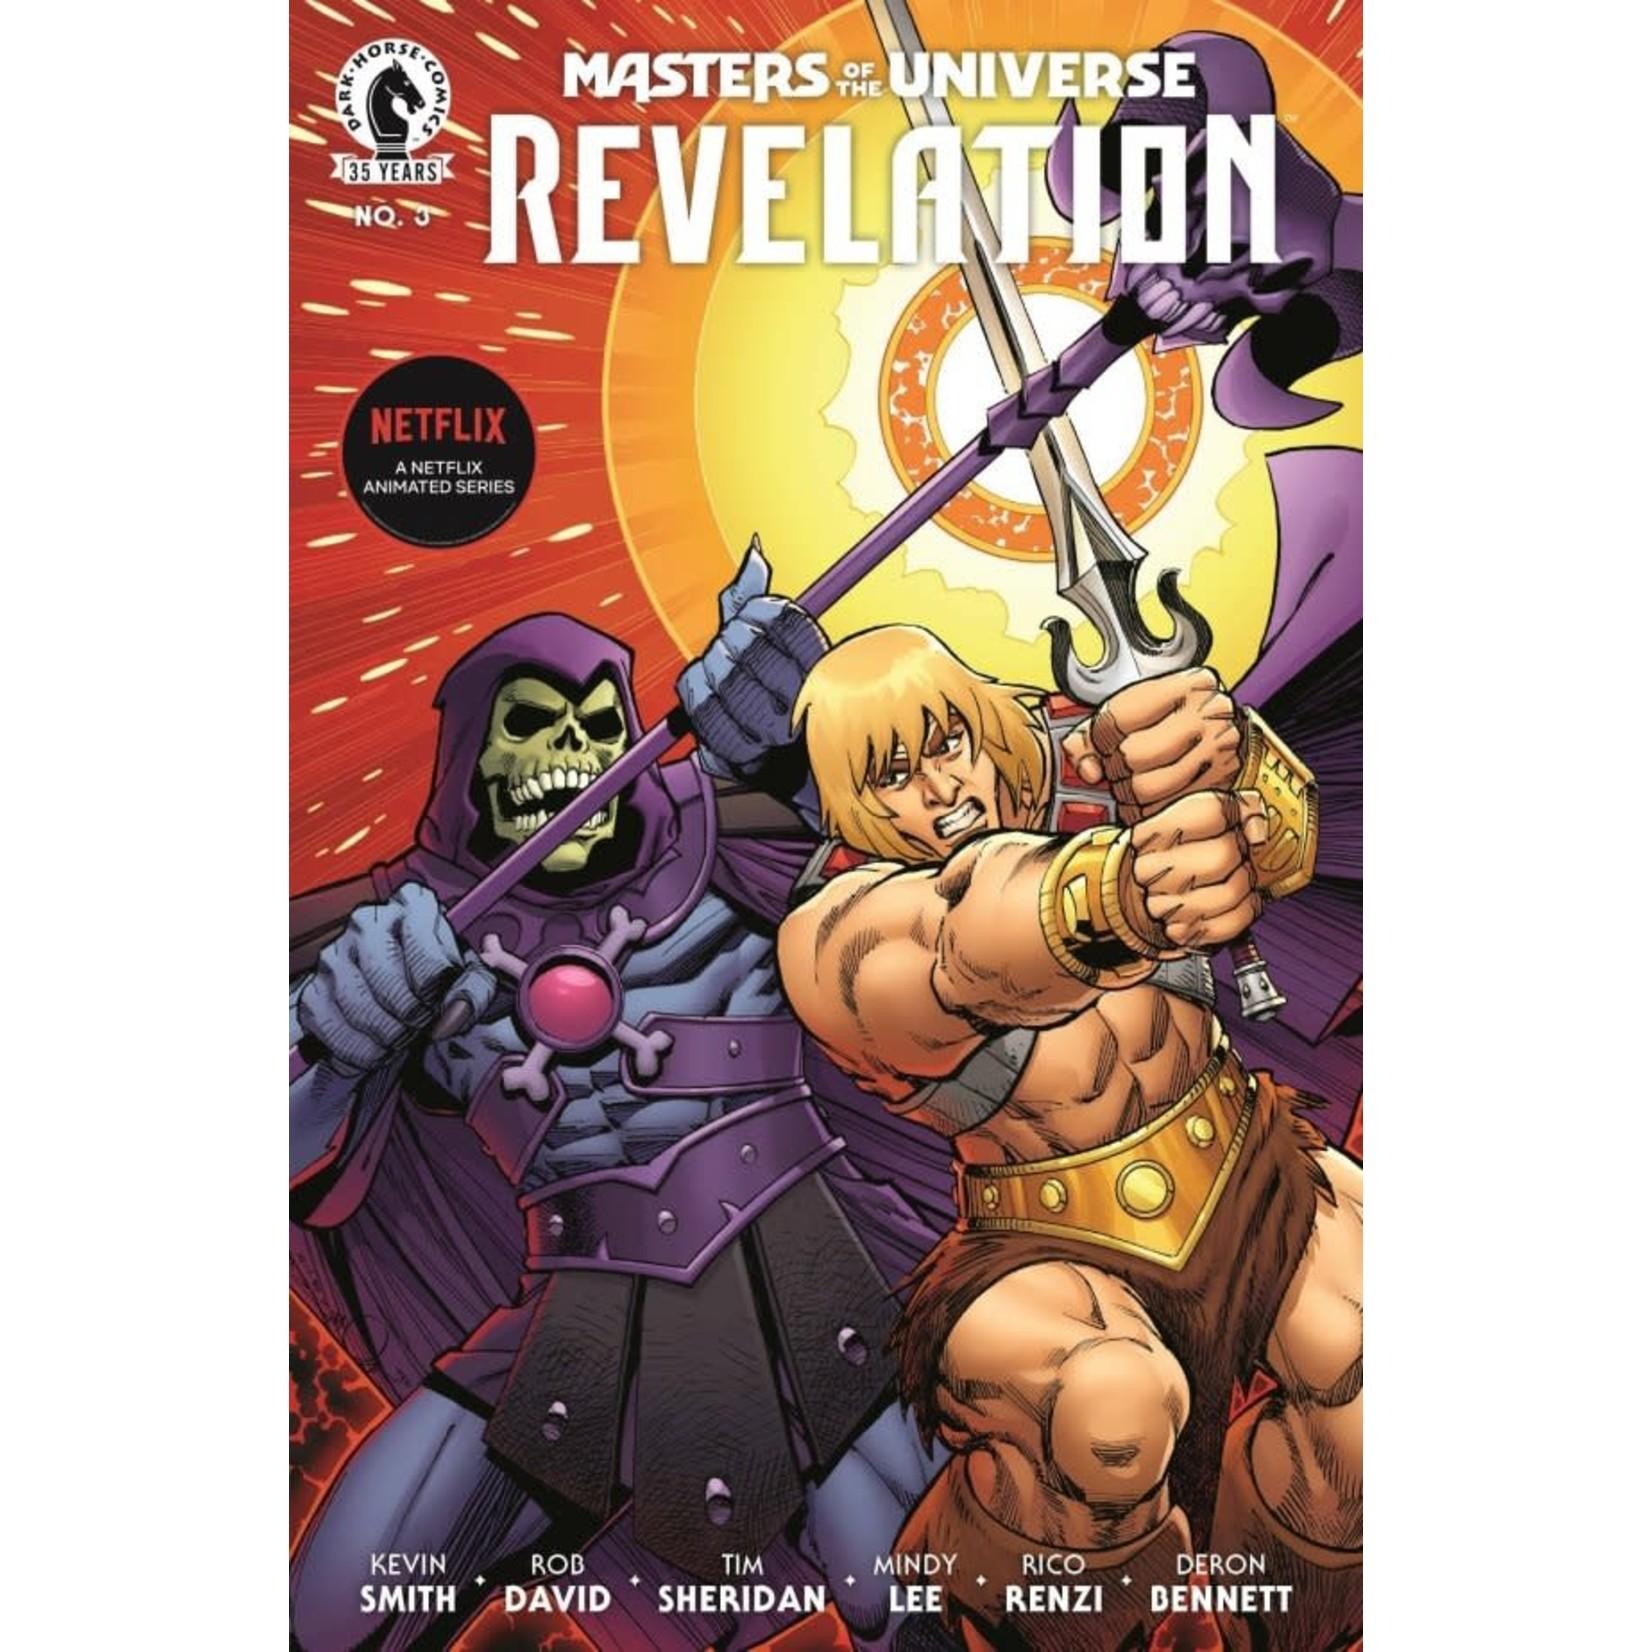 Dark Horse Copy of Master of the universe Revelation #3